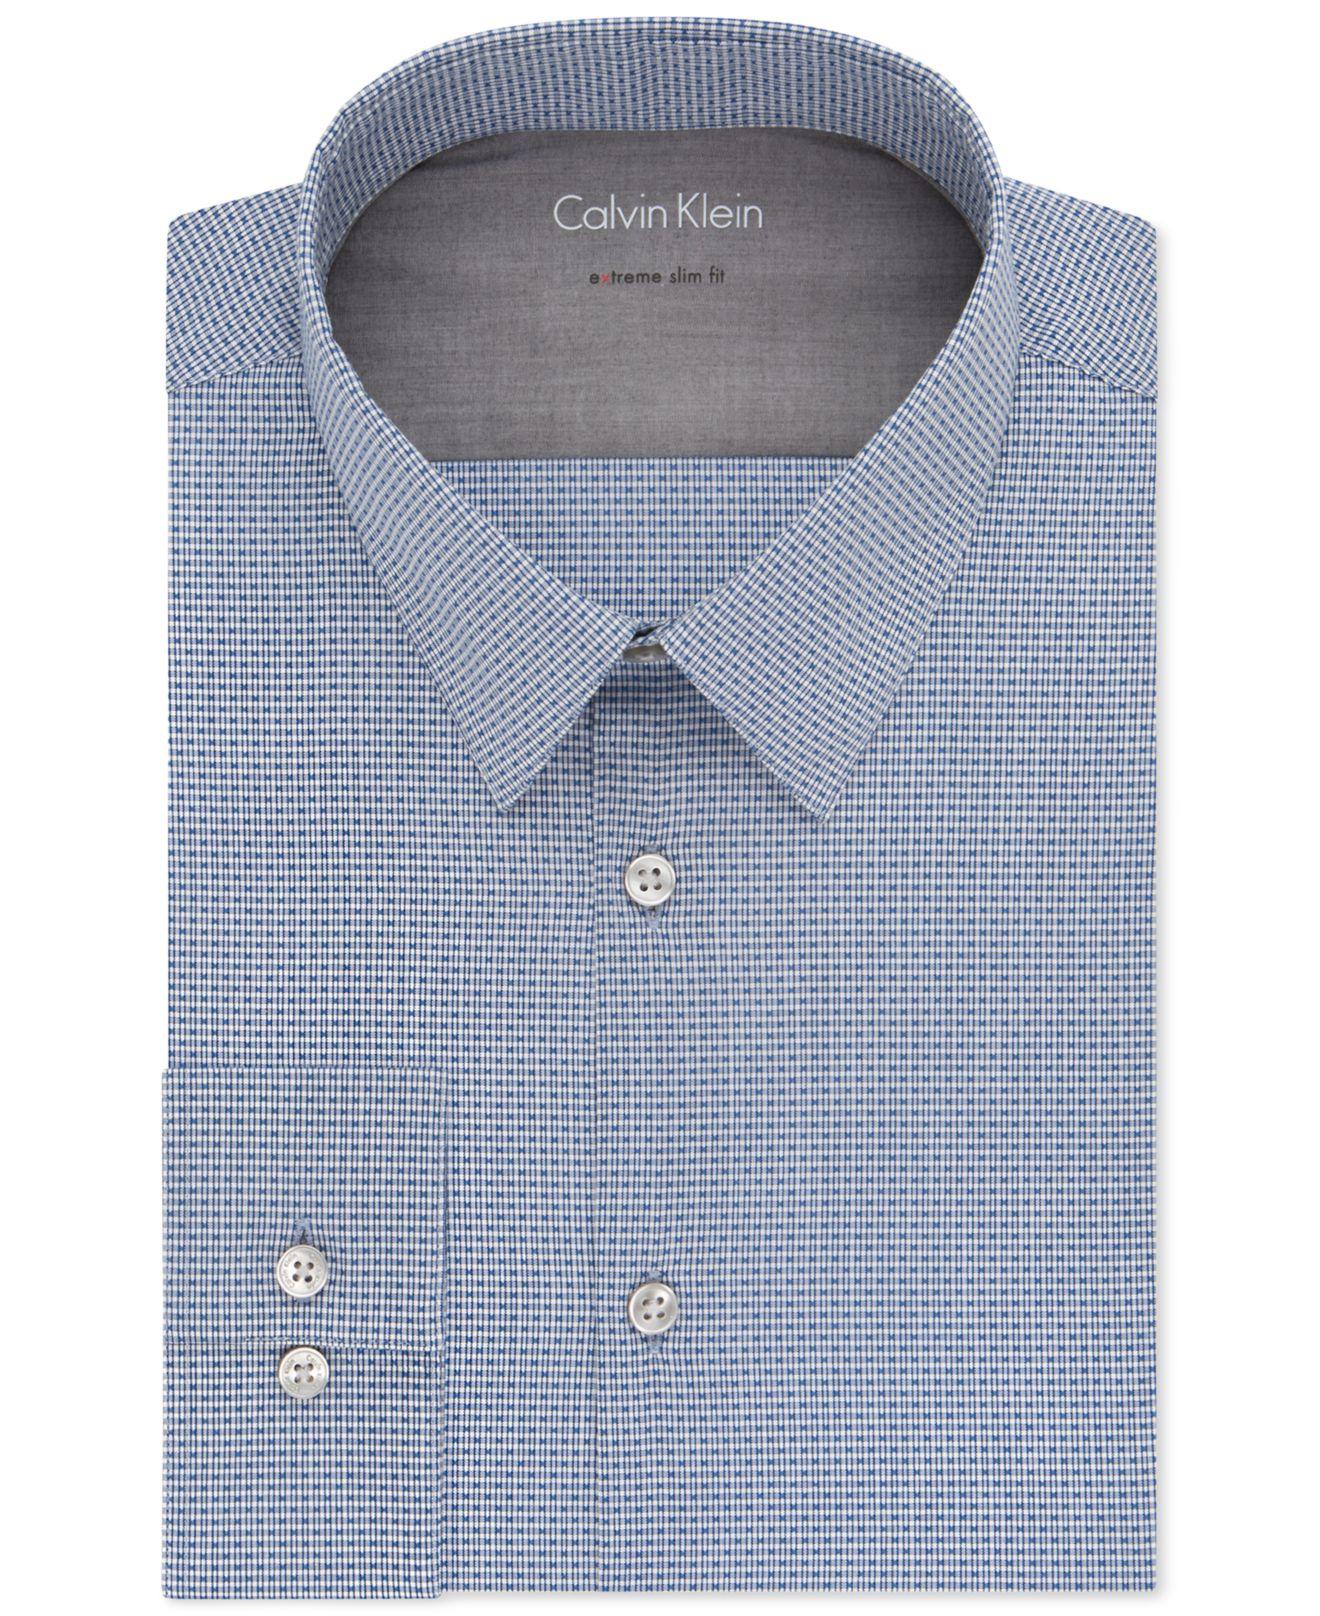 Calvin klein x extra slim fit stream blue dobby check for Calvin klein x fit dress shirt